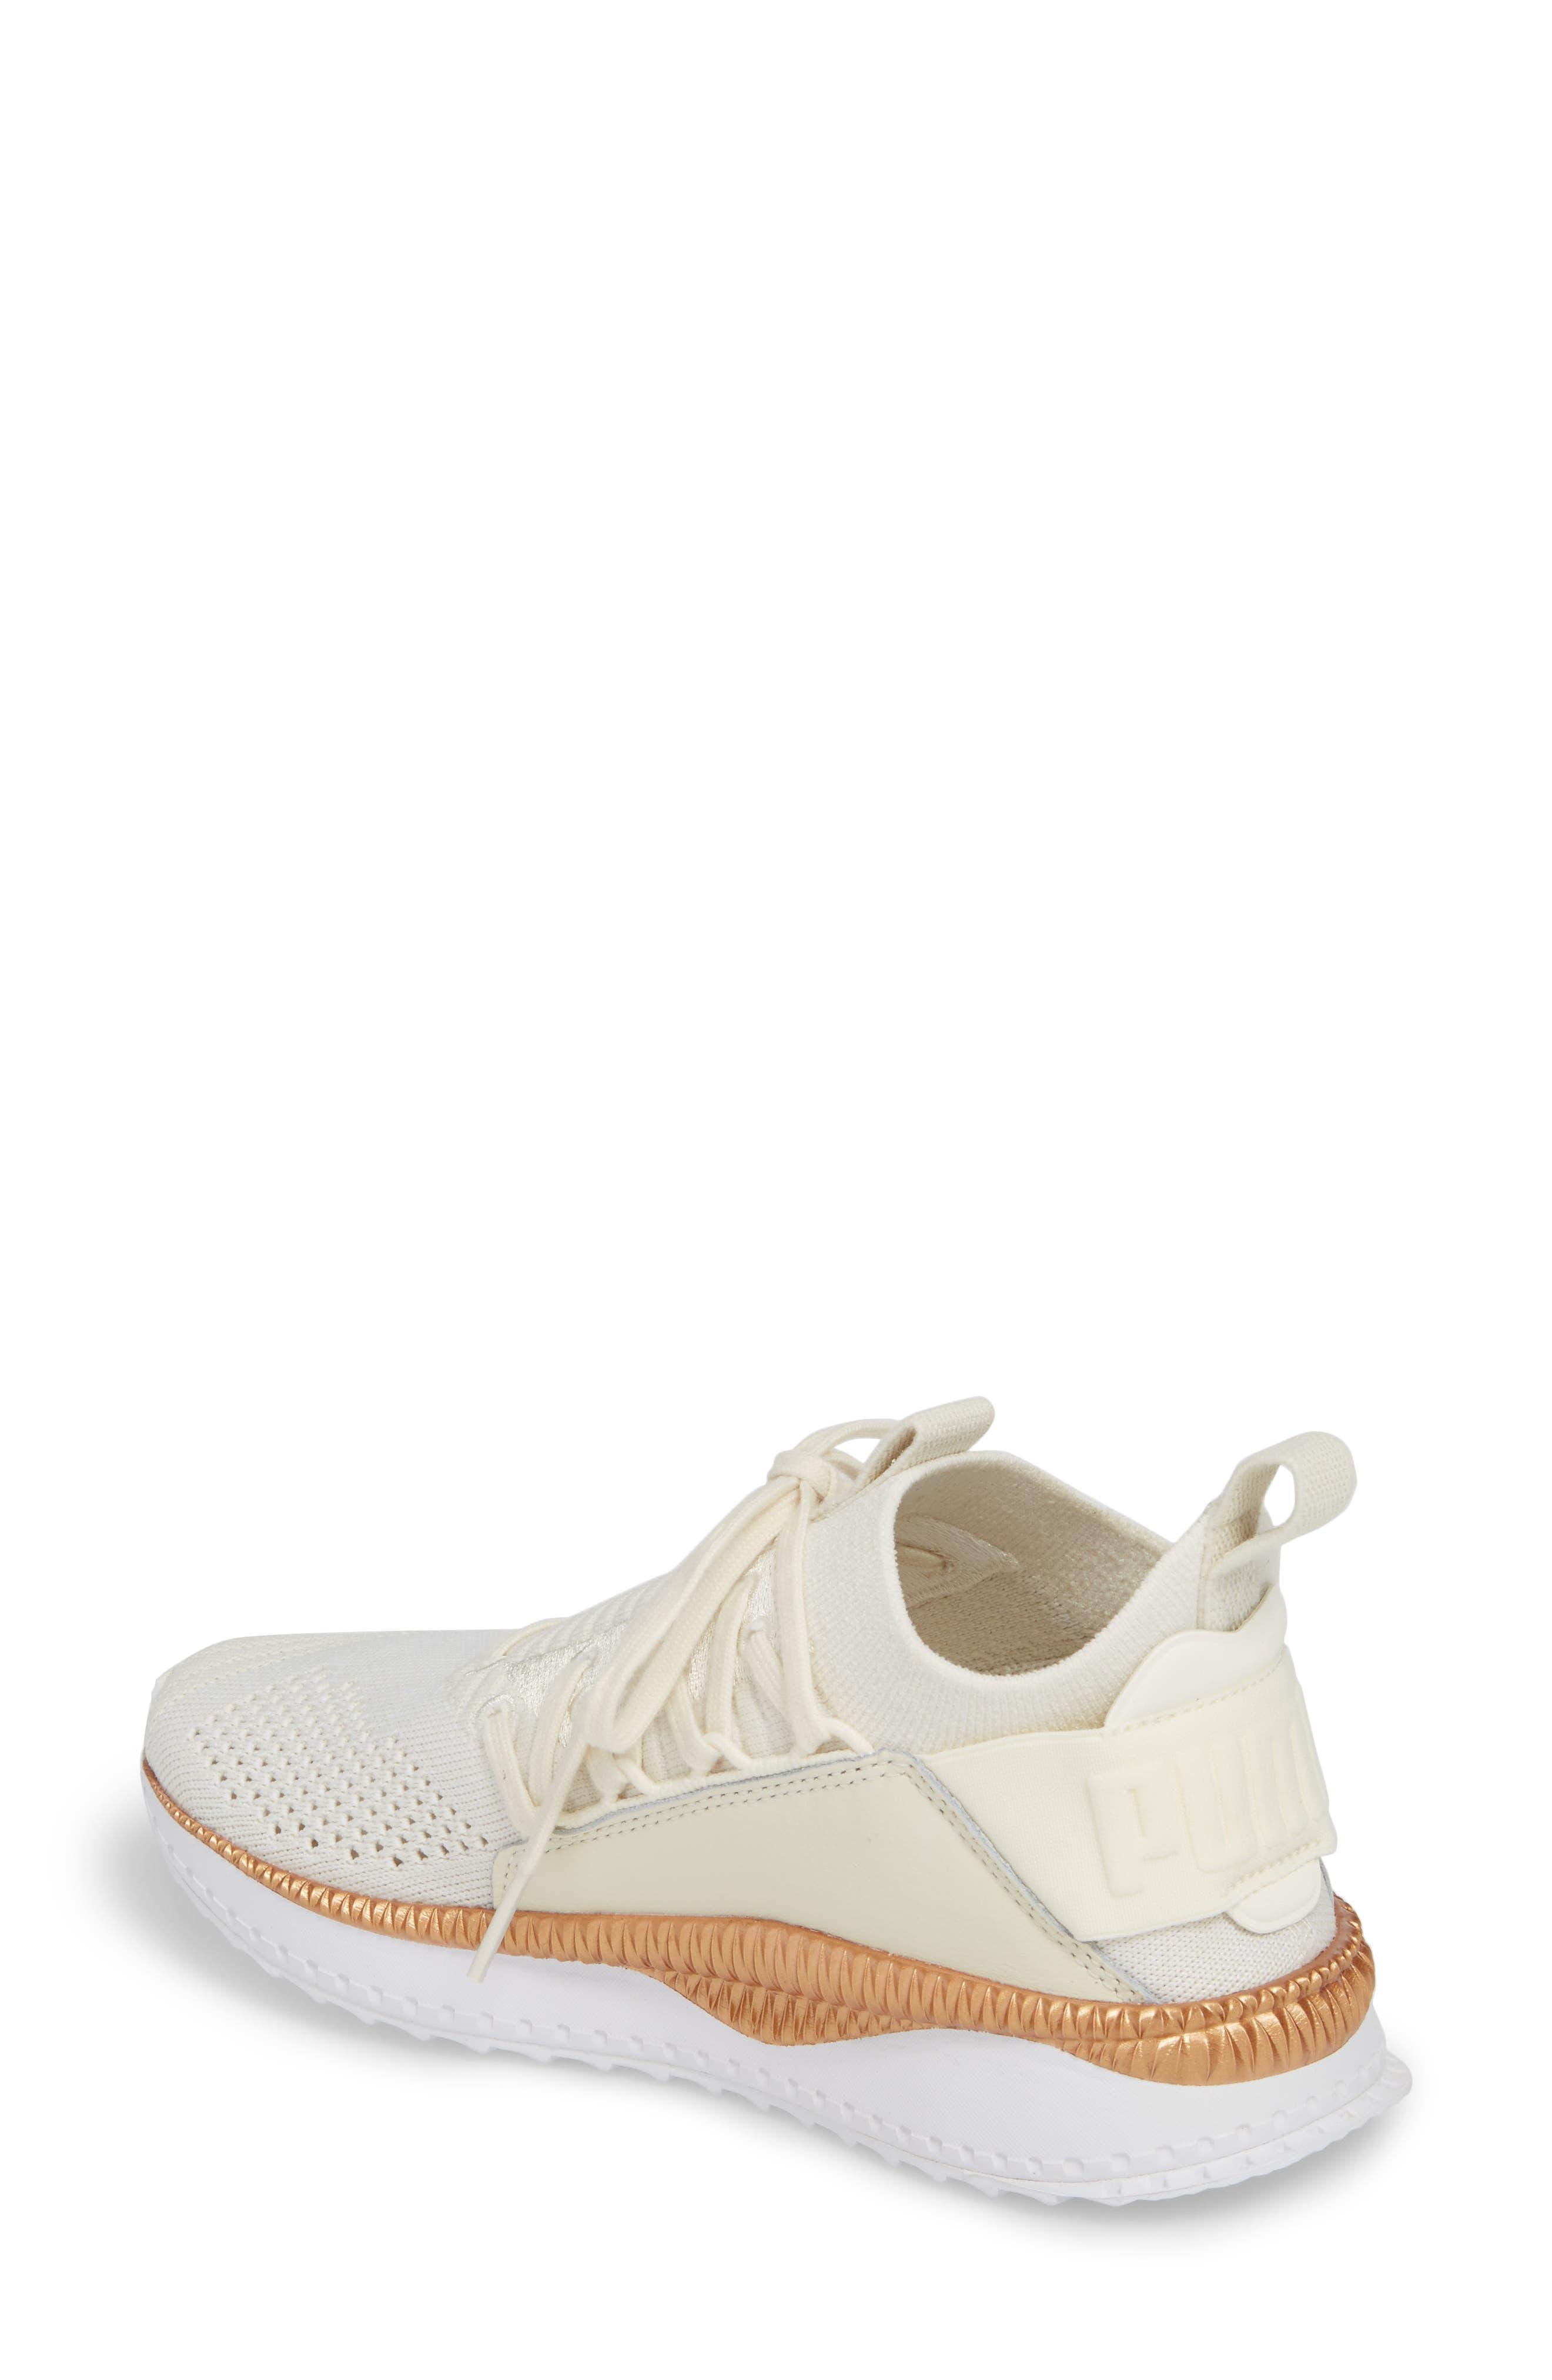 Tsugi Jun Knit Sneaker,                             Alternate thumbnail 12, color,